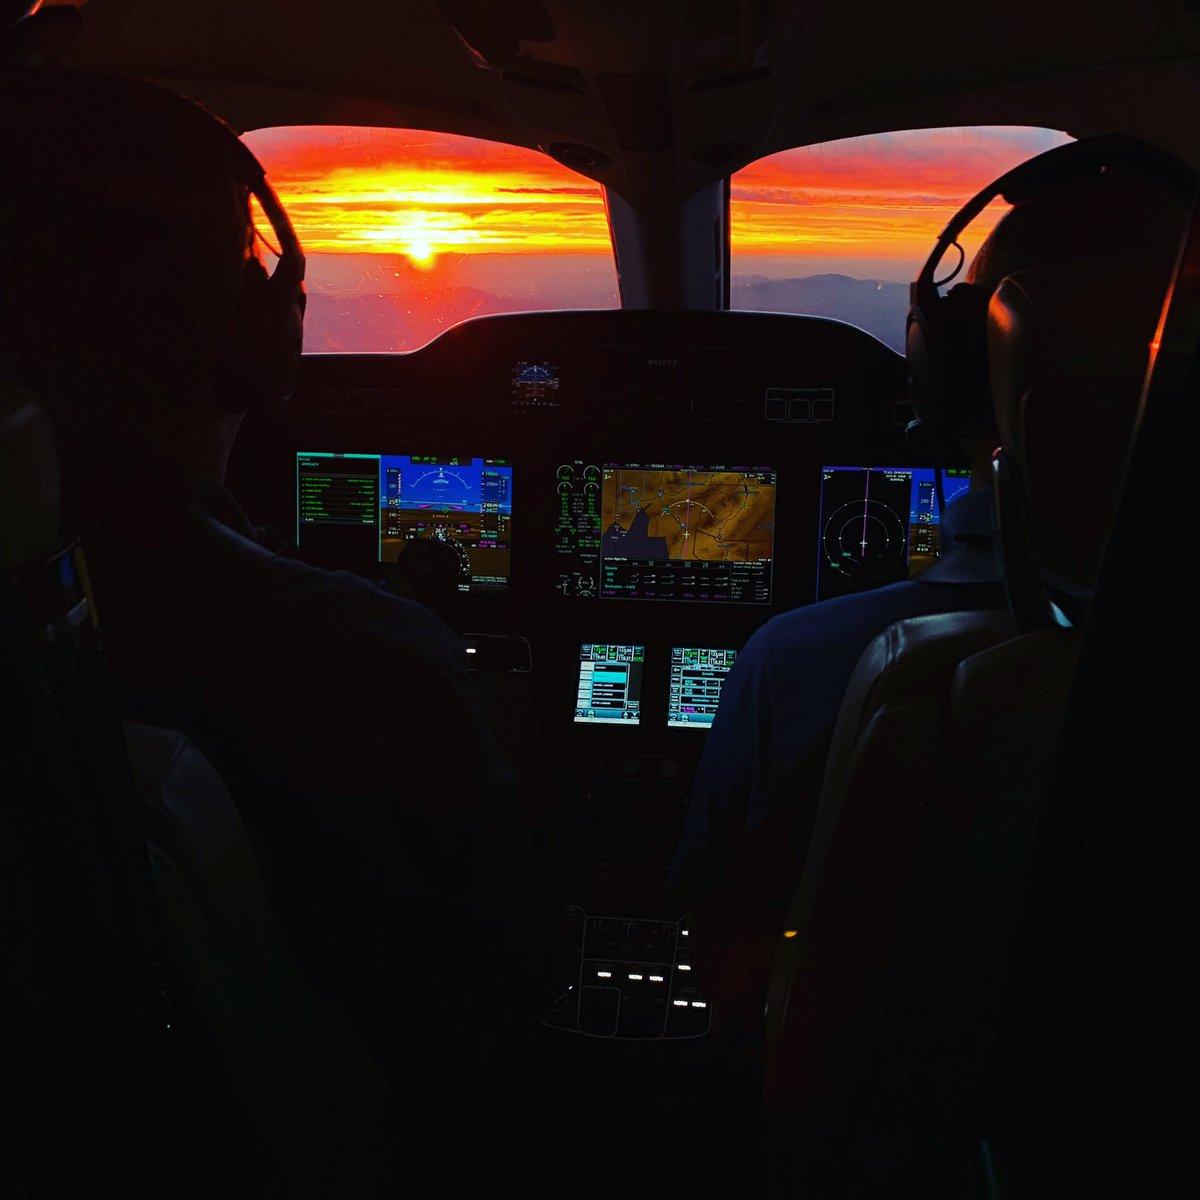 Memories of a beautiful #aircraftview #sunset during an evening #HondaJetElite demo flight out of #KTUS #saturdaynight  #aviation #aircraft #businessjet #bizav #avgeek #aviationnews #hondajet #hondajetelite #G3000 #garmin #garminaviation #hondajet #hondajetelite #hondaaircraftco https://t.co/m8lZdLFxih